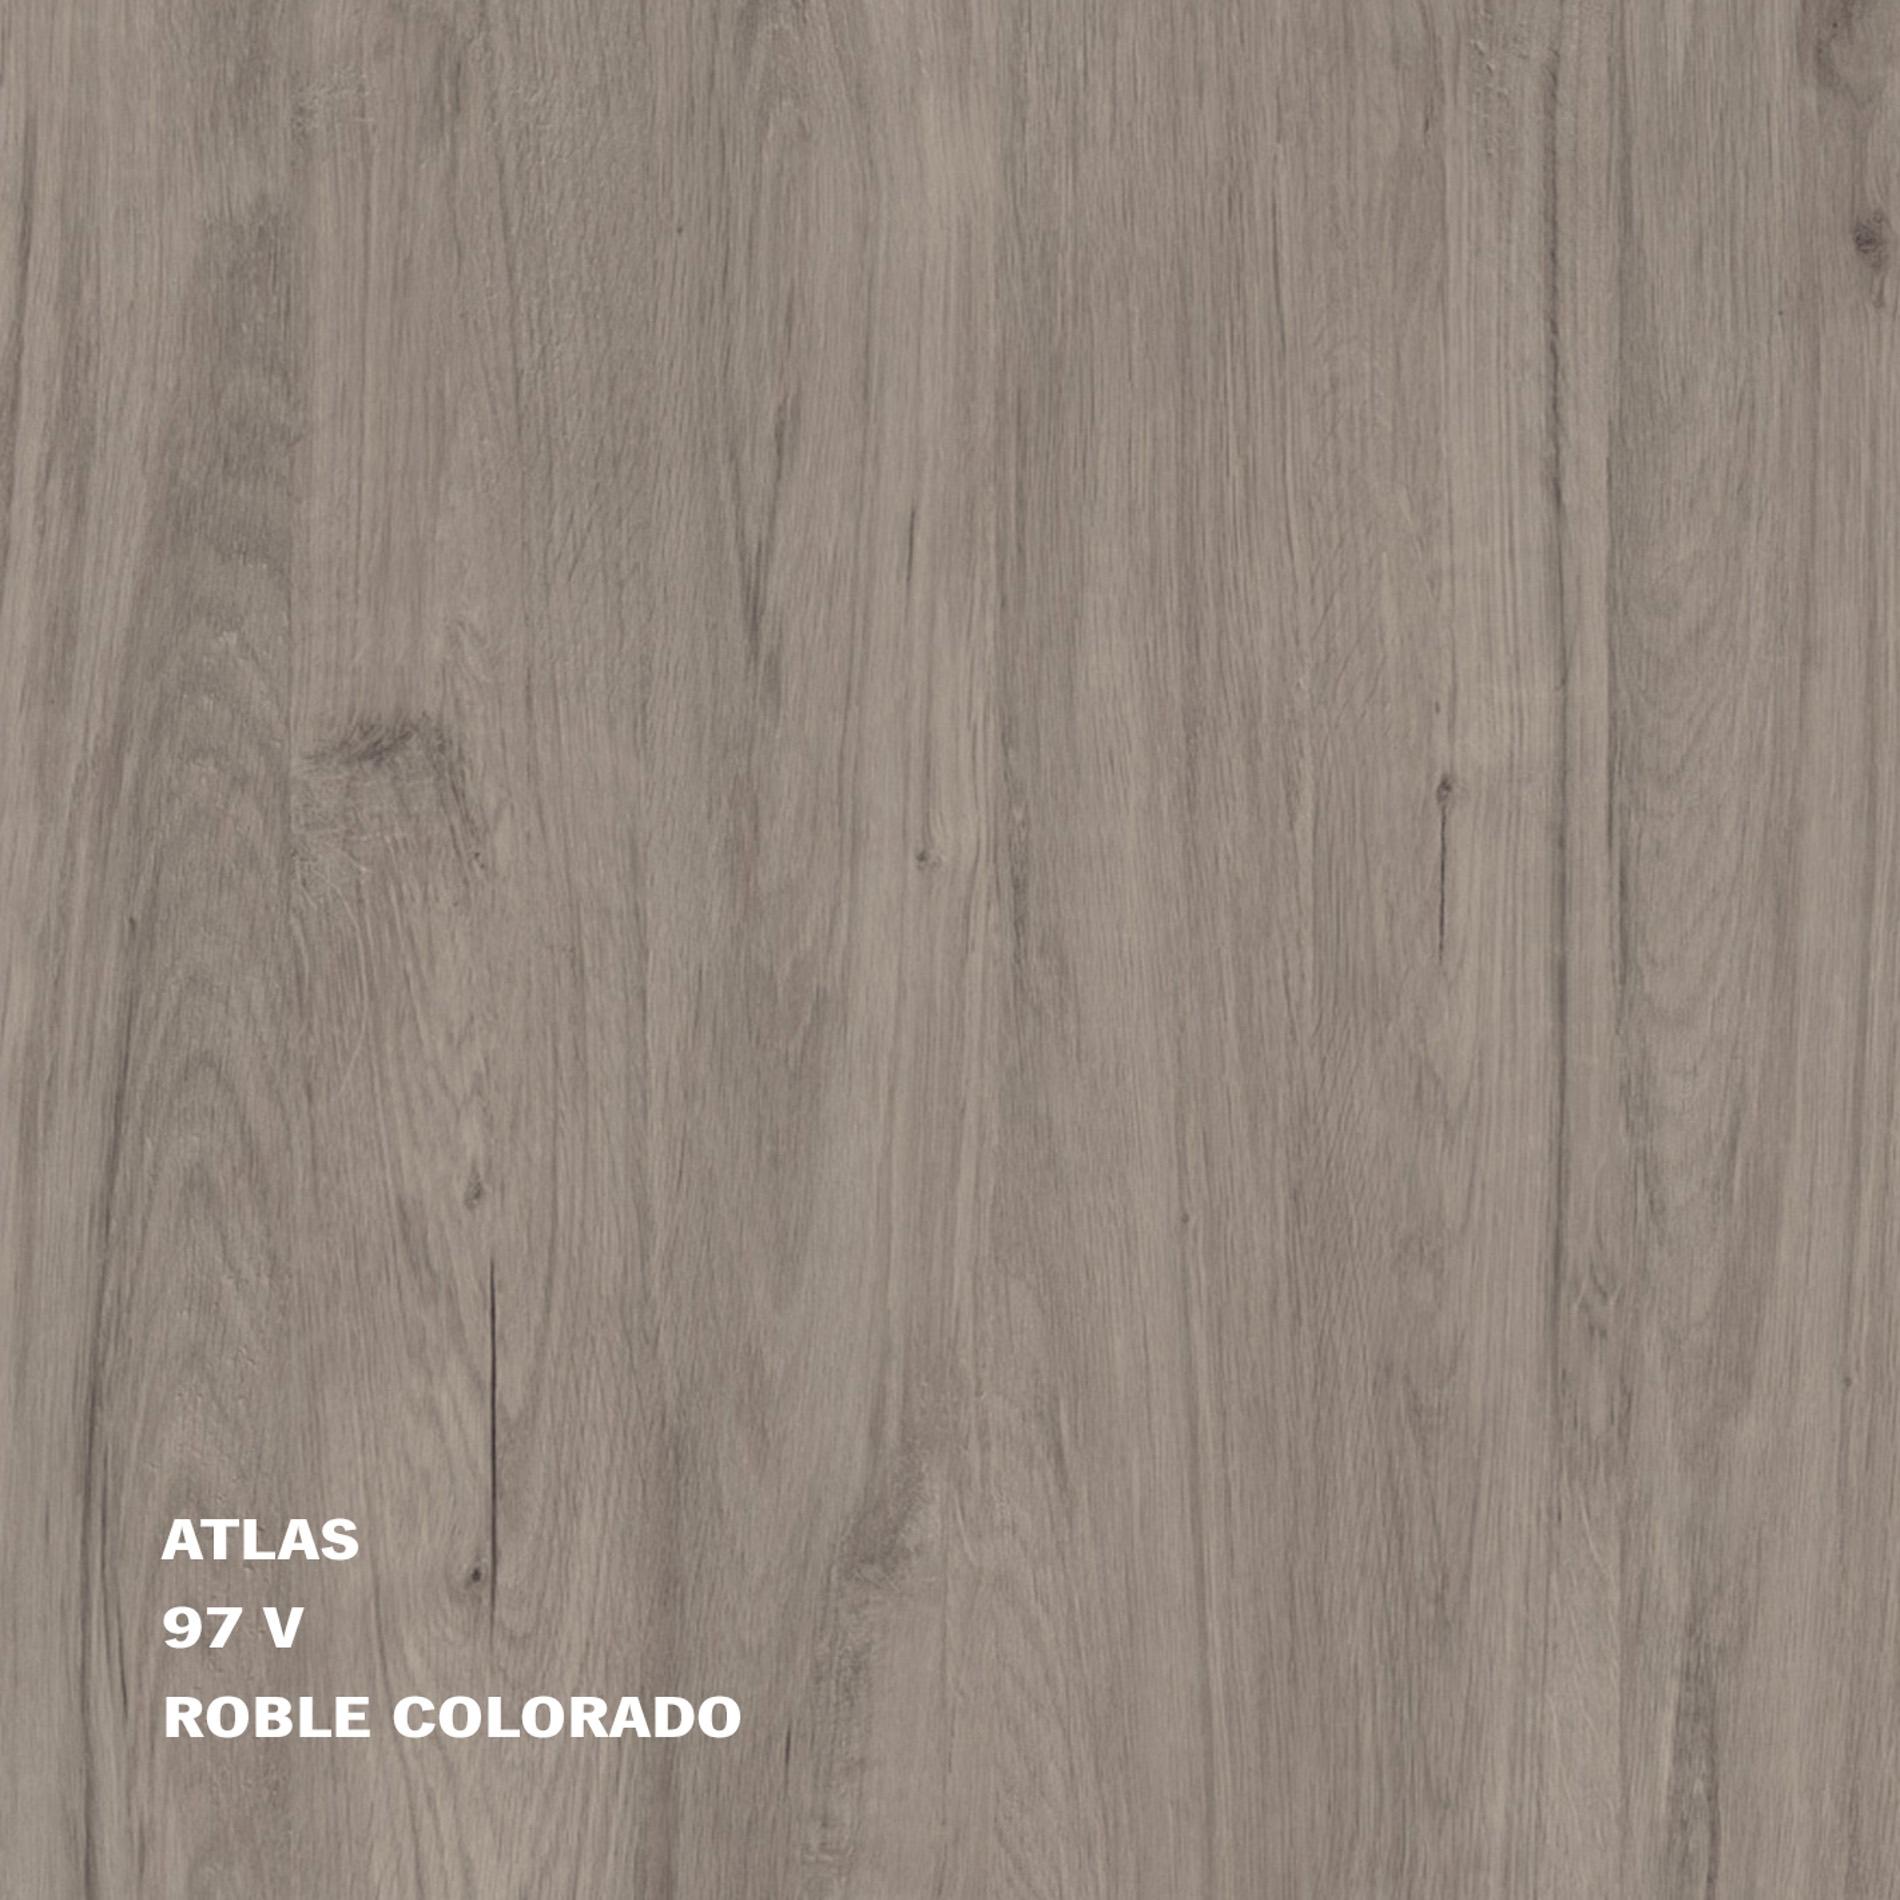 97V Roble Colorado_ATLAS